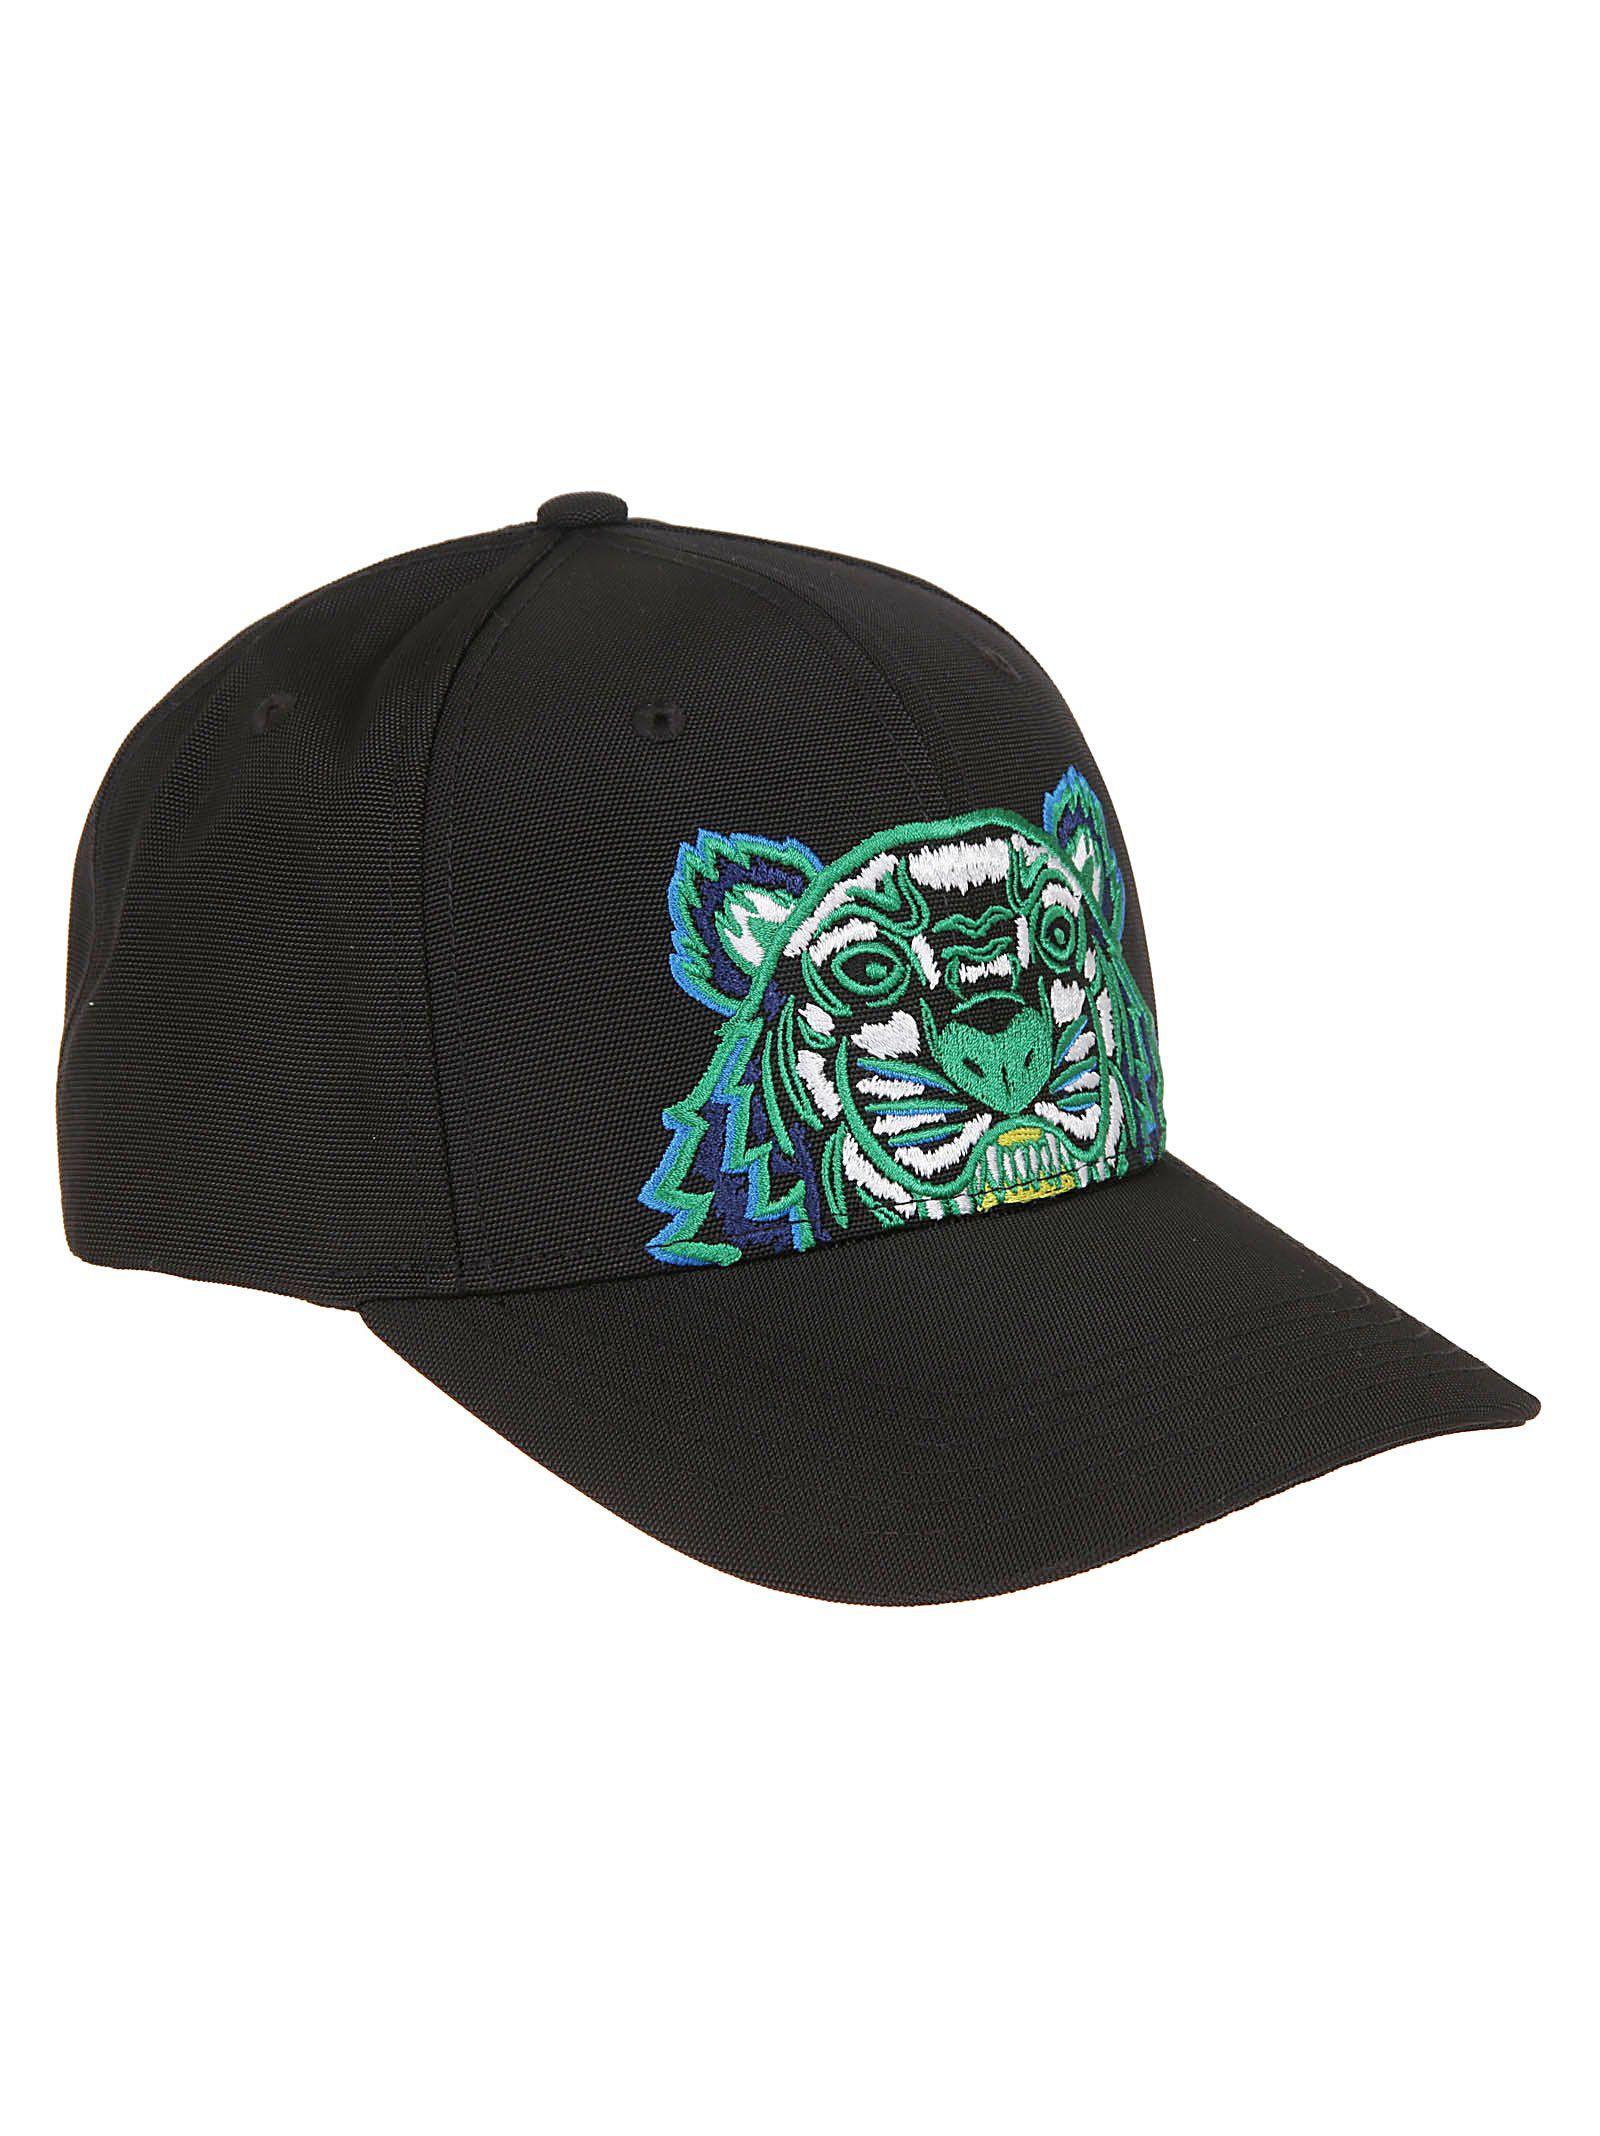 4d1b7392b KENZO TIGER CAP. #kenzo | Kenzo in 2019 | Kenzo, Baseball hats, Mens ...